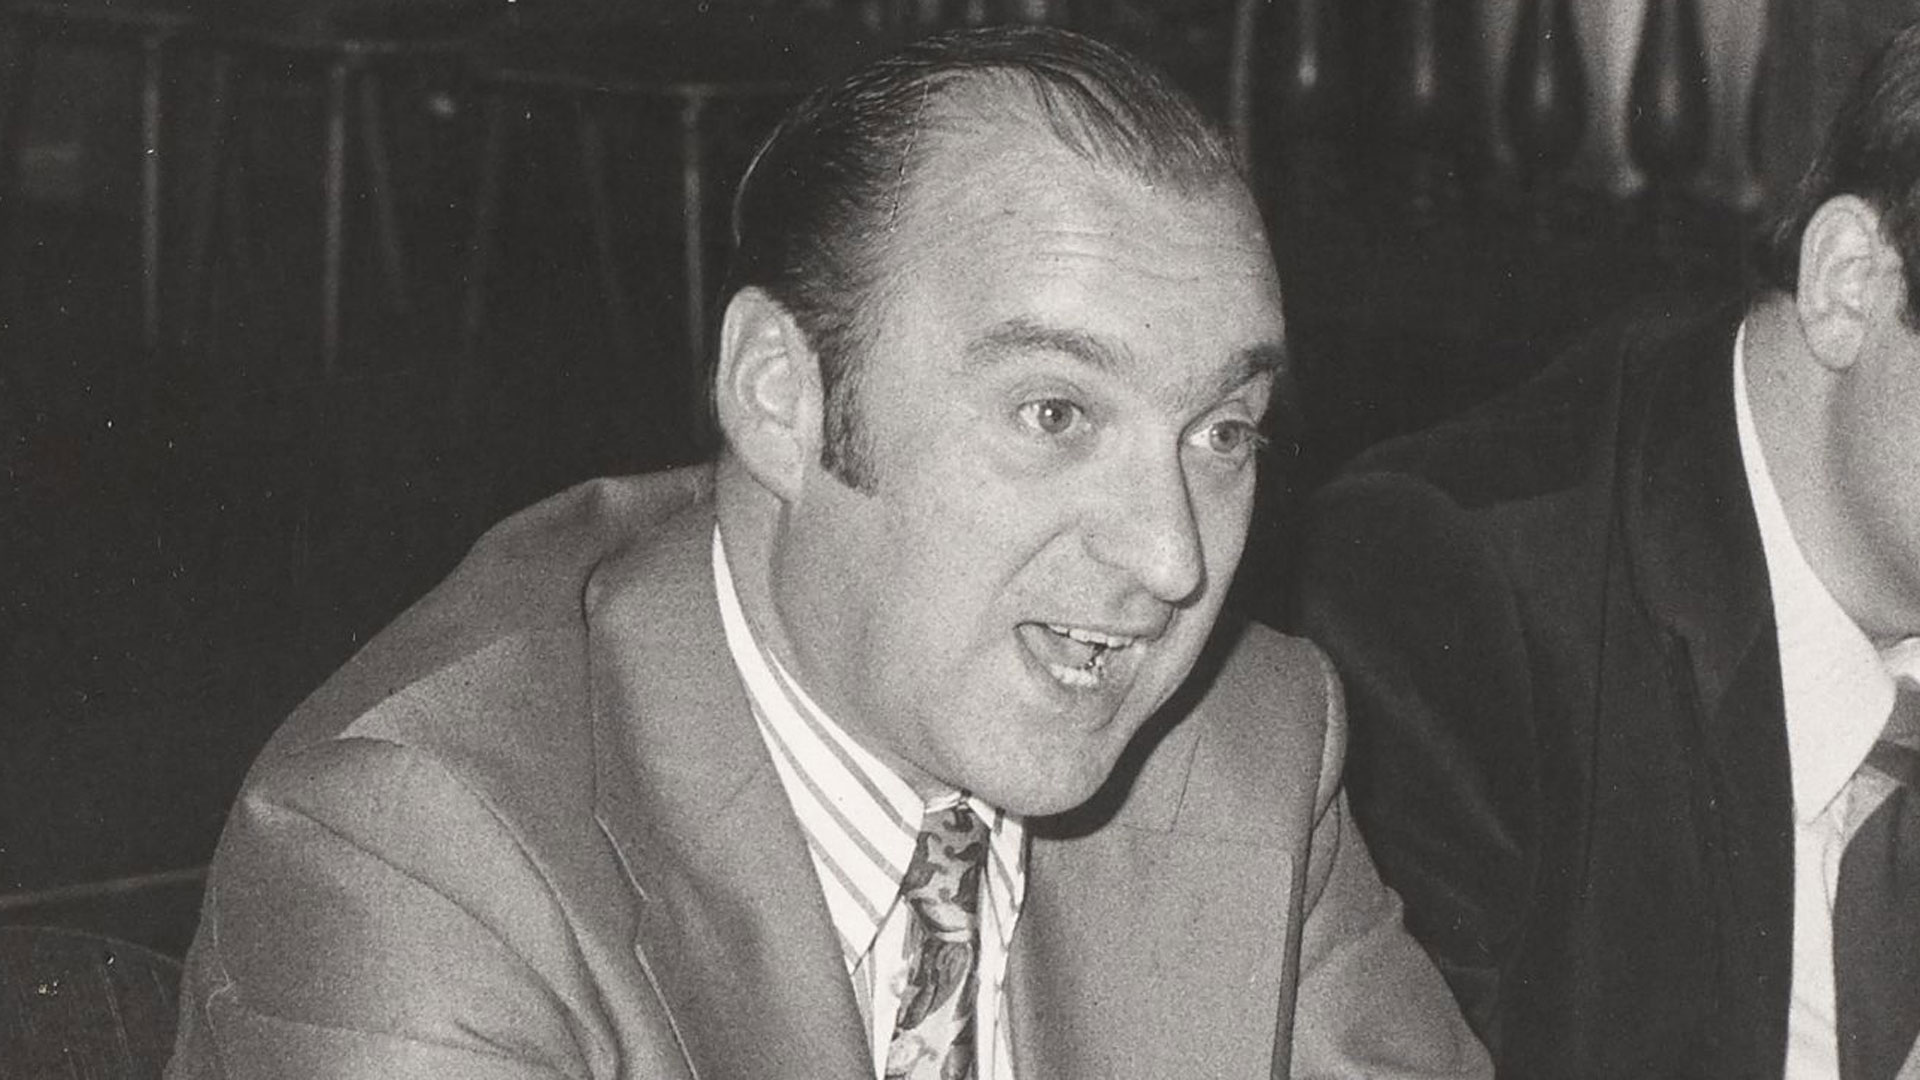 Heinz Warneke